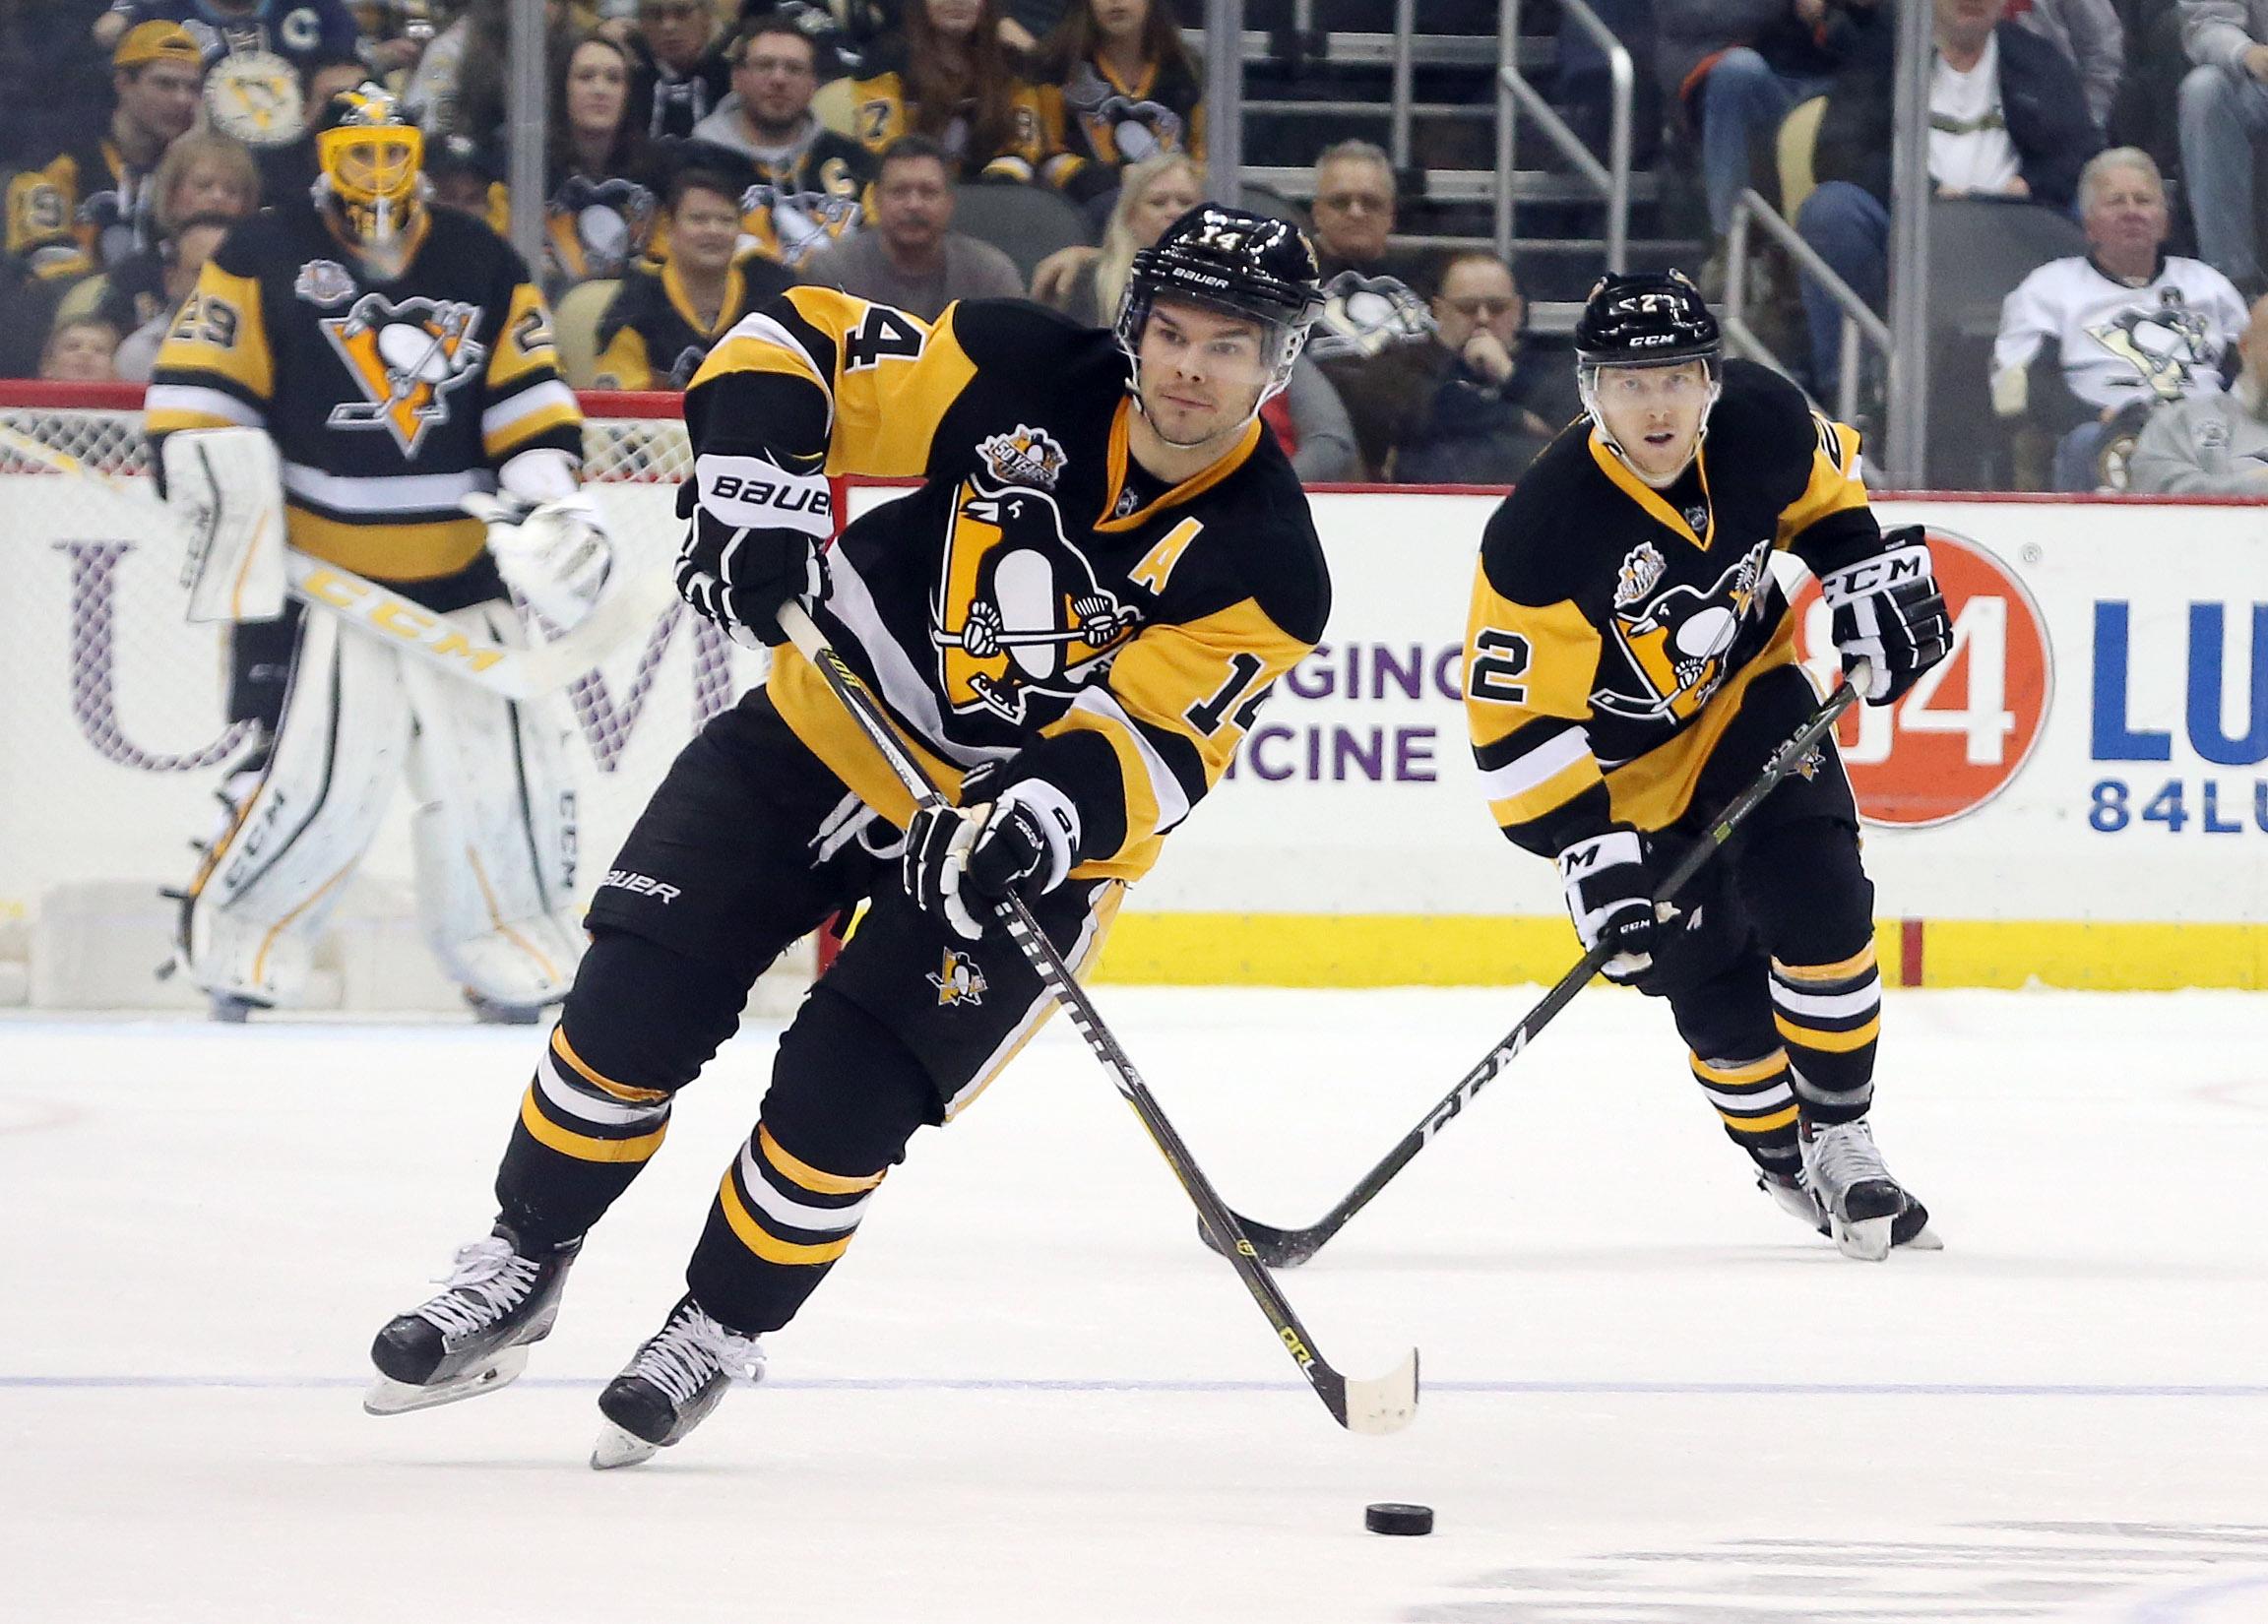 Ice Hockey Tips & Free Betting Predictions